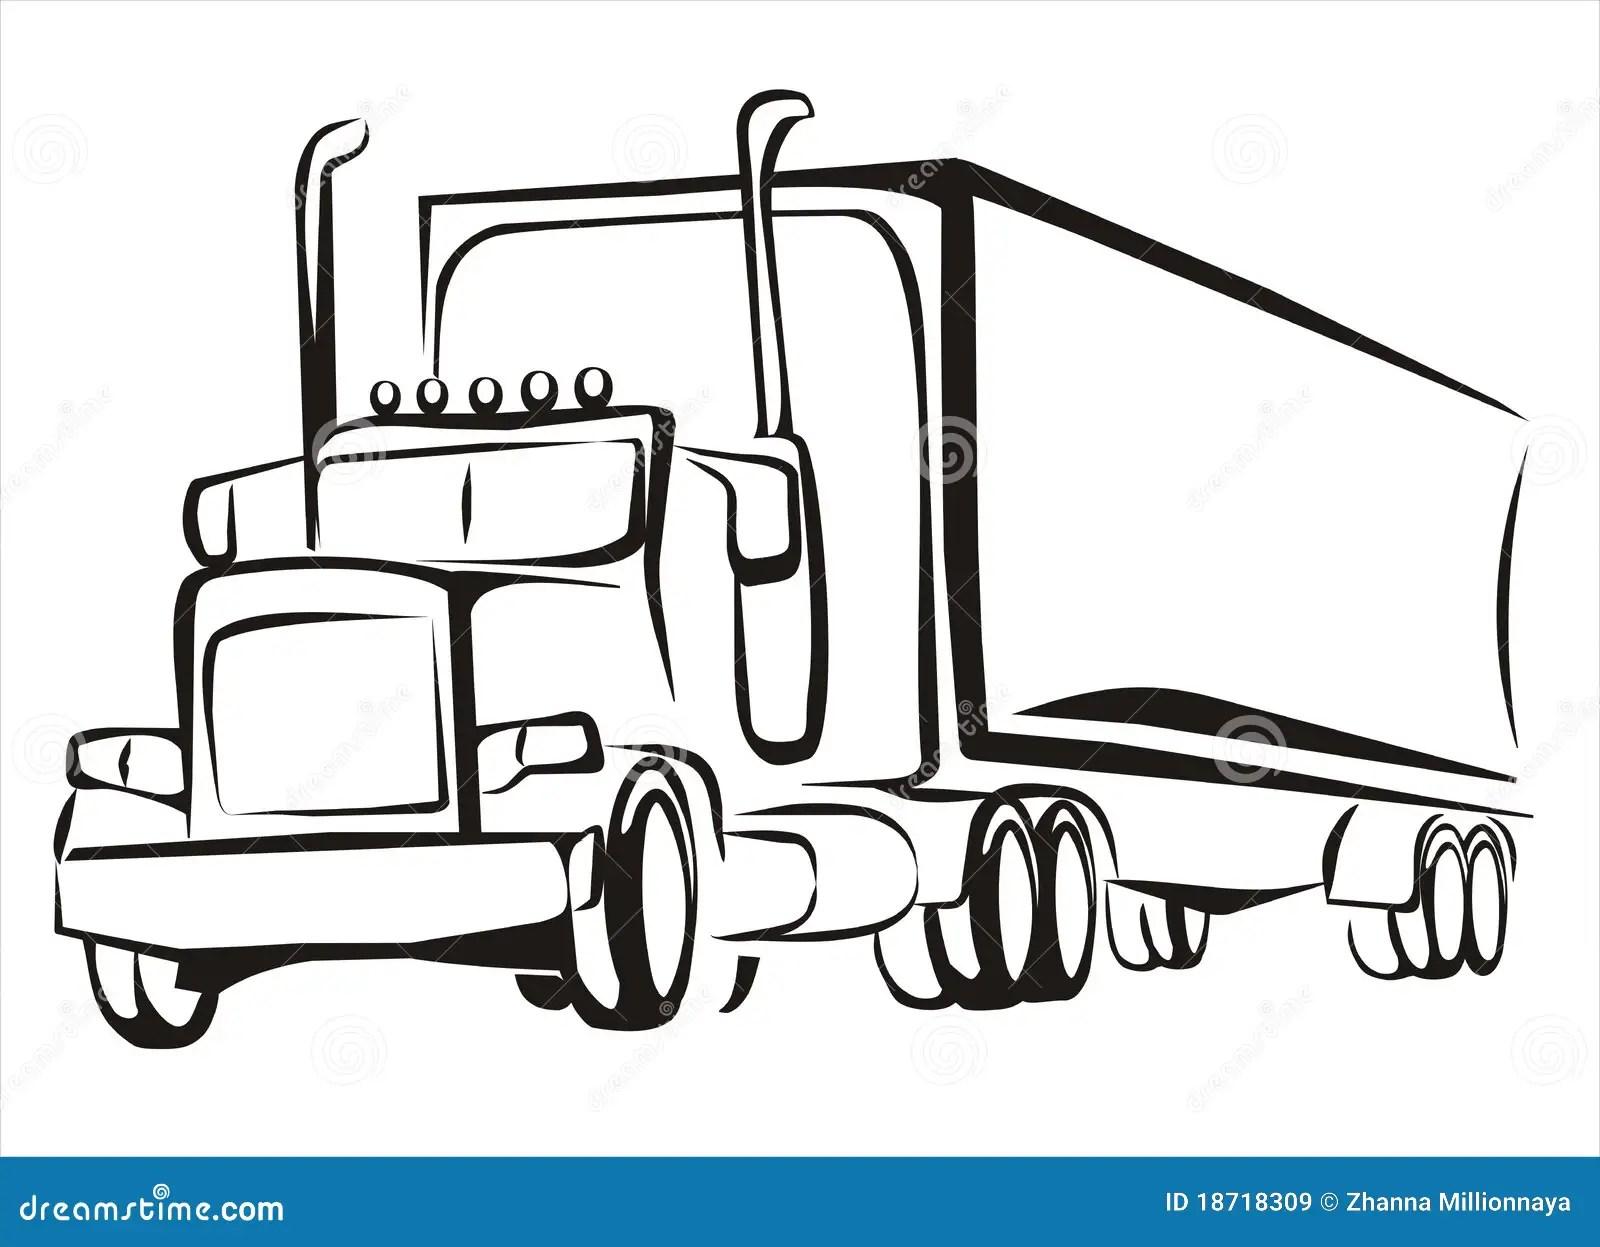 Truck Lorry Iosolated Illustration Stock Vector